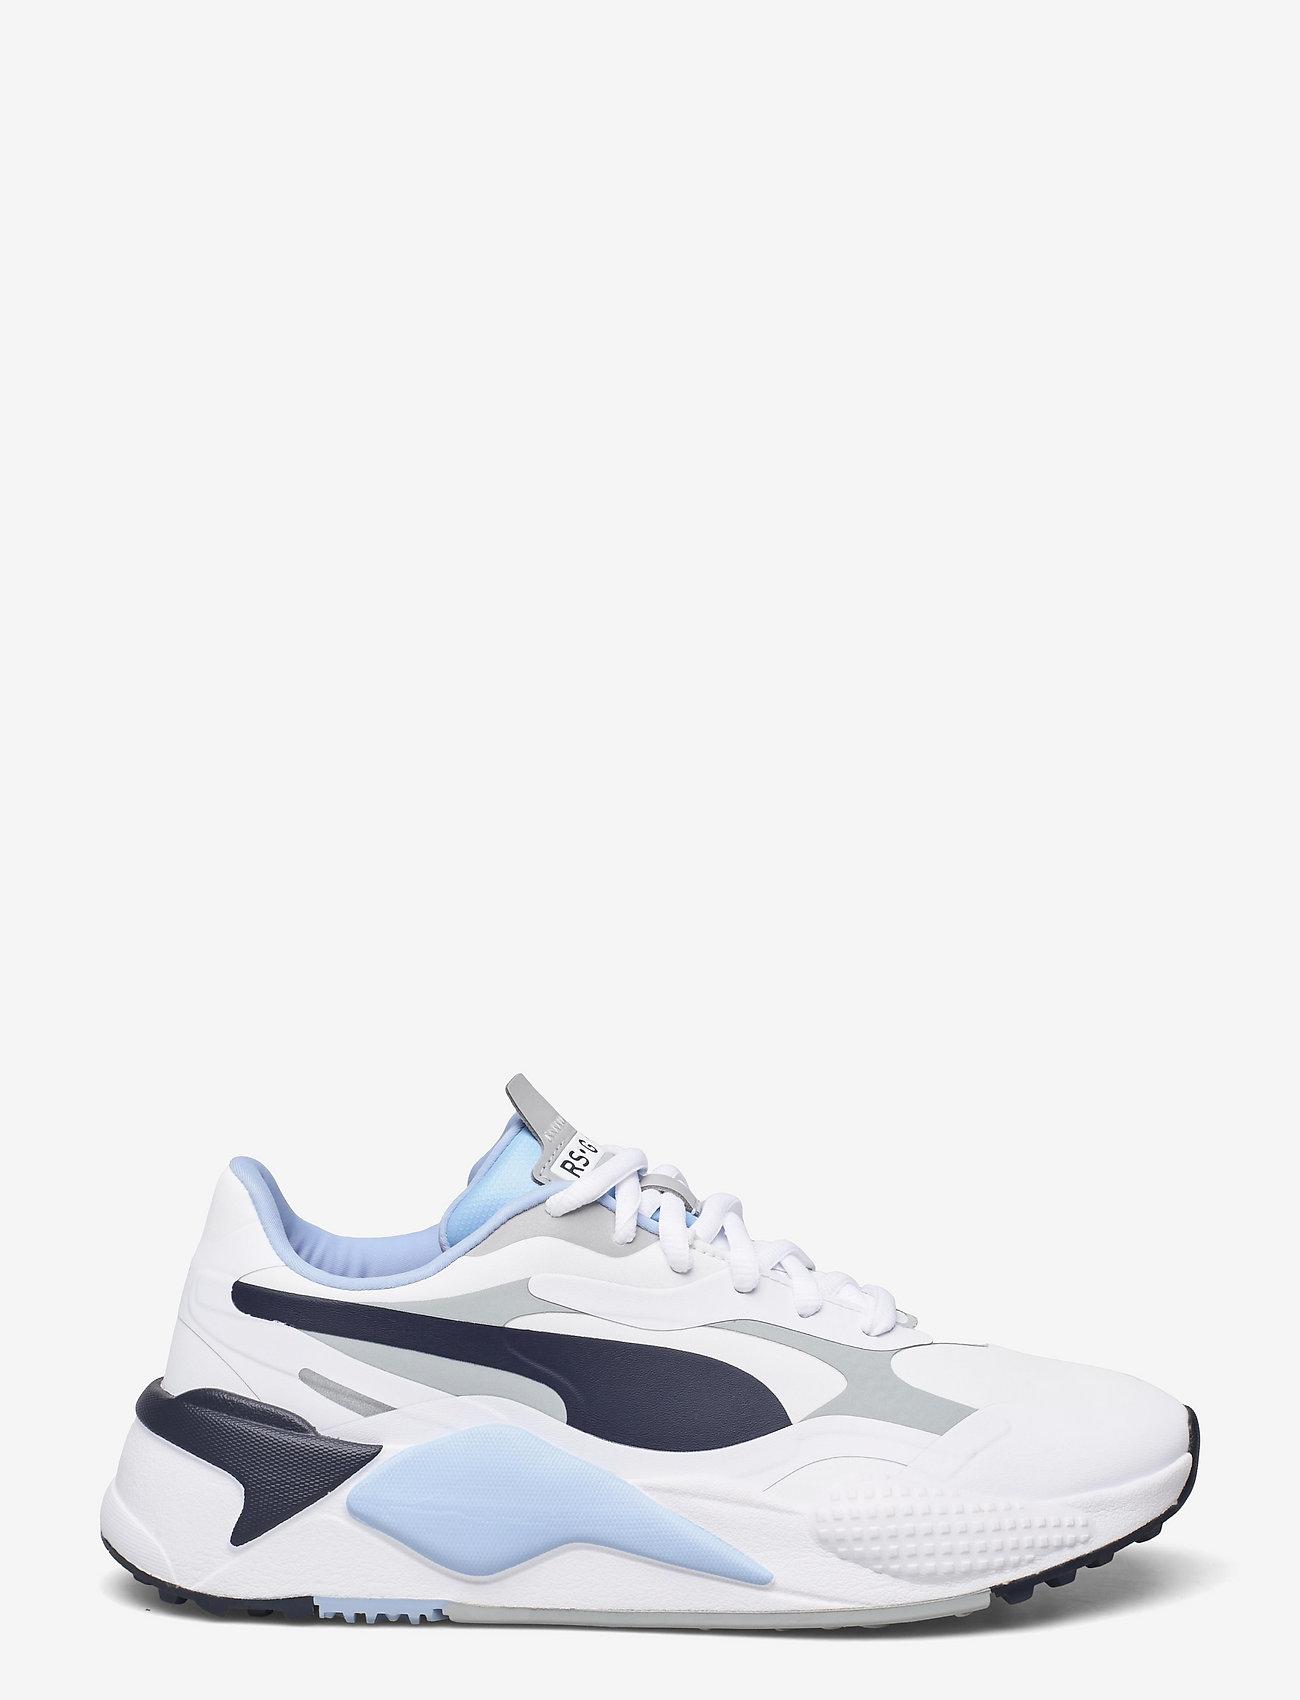 PUMA Golf - RS-G - golfschoenen - puma white-navy blazer-placid blue - 1